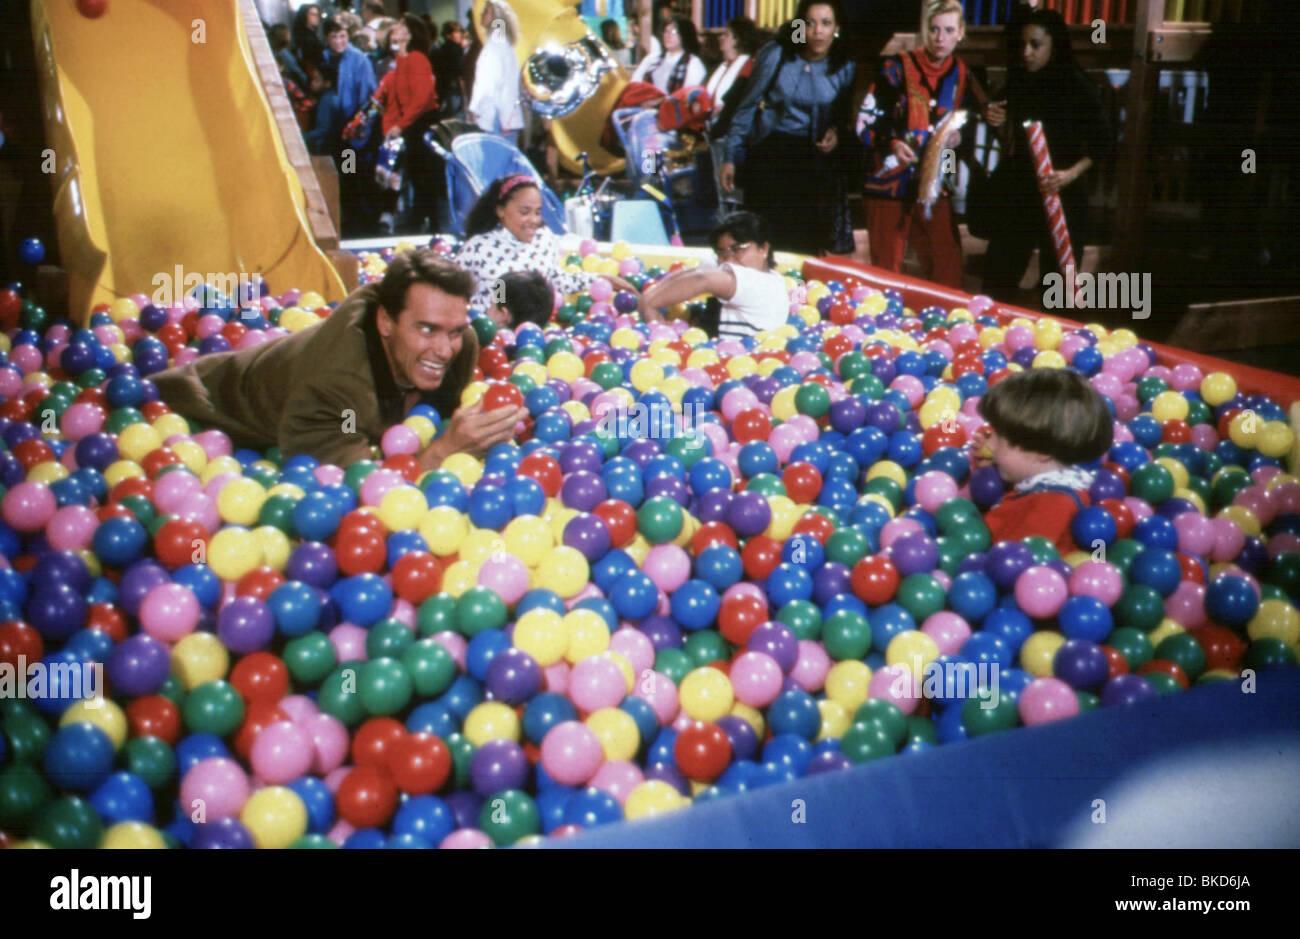 Jingle All The Way 1996 Arnold Schwarzenegger Jatw 008 Stock Photo Alamy